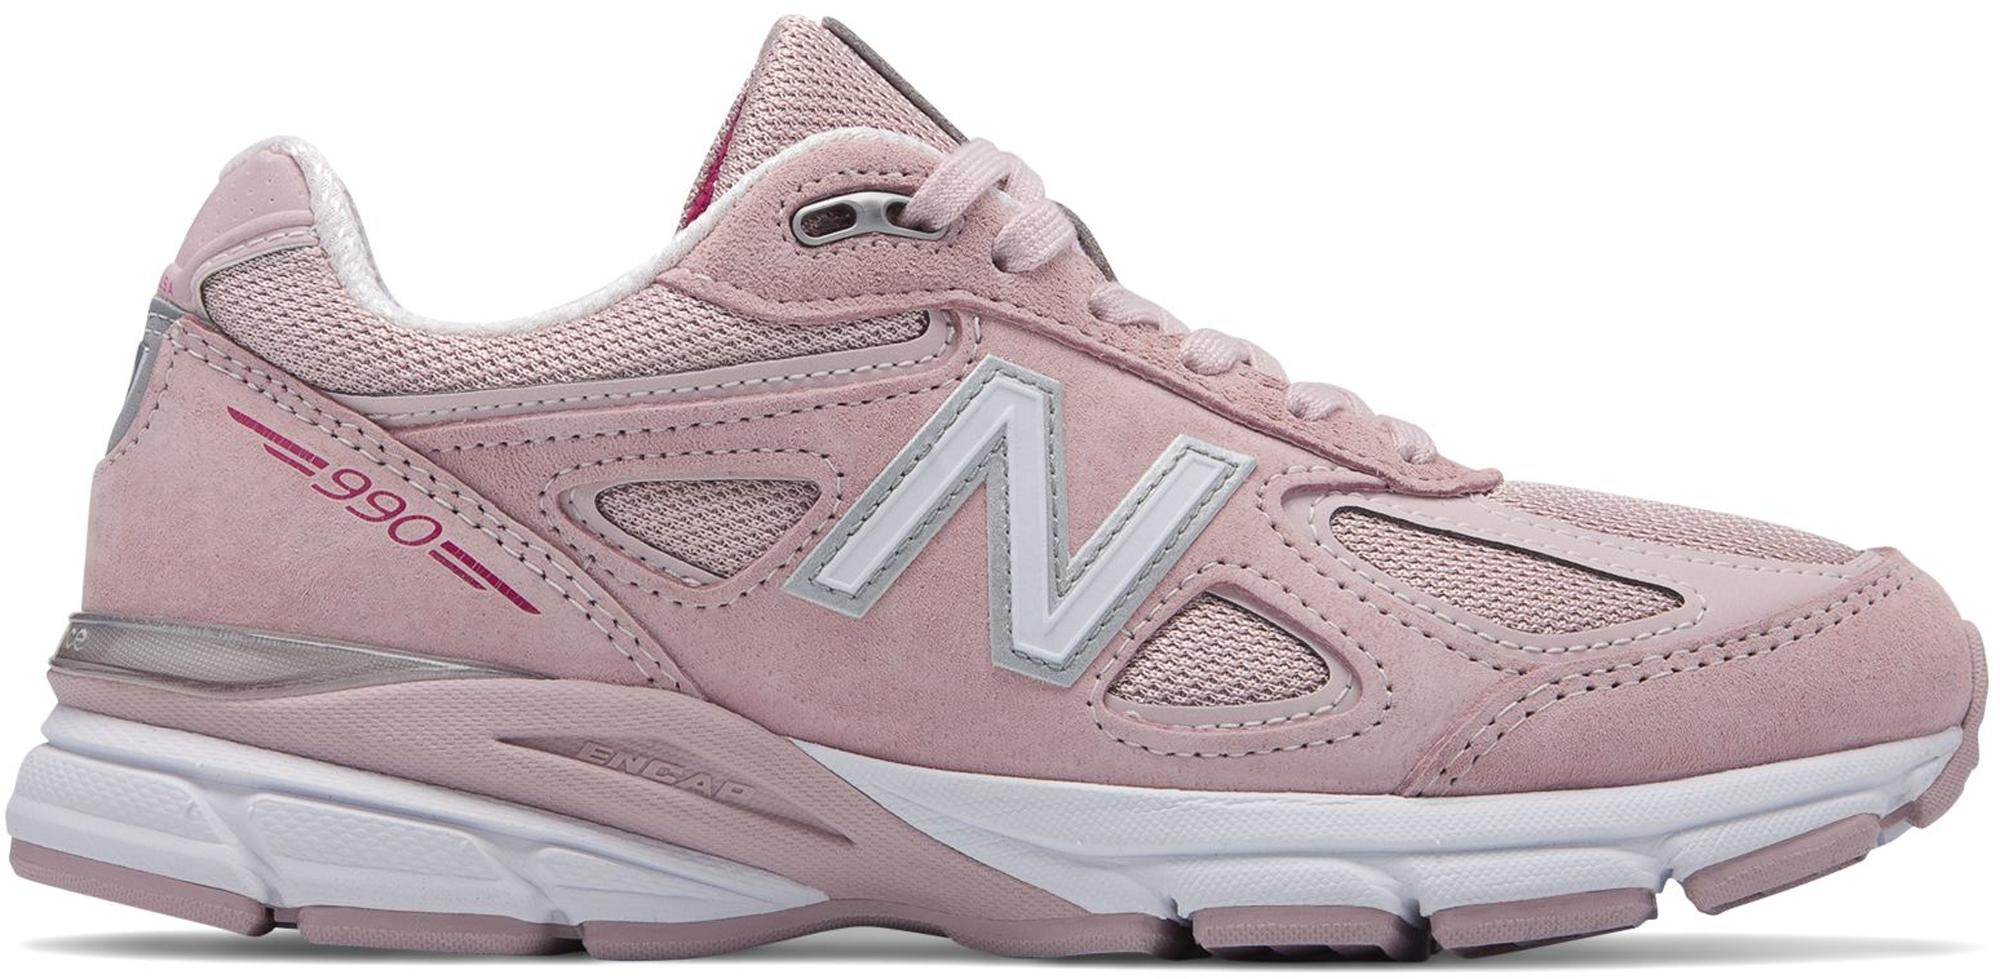 New Balance 990v4 Pink Ribbon Faded